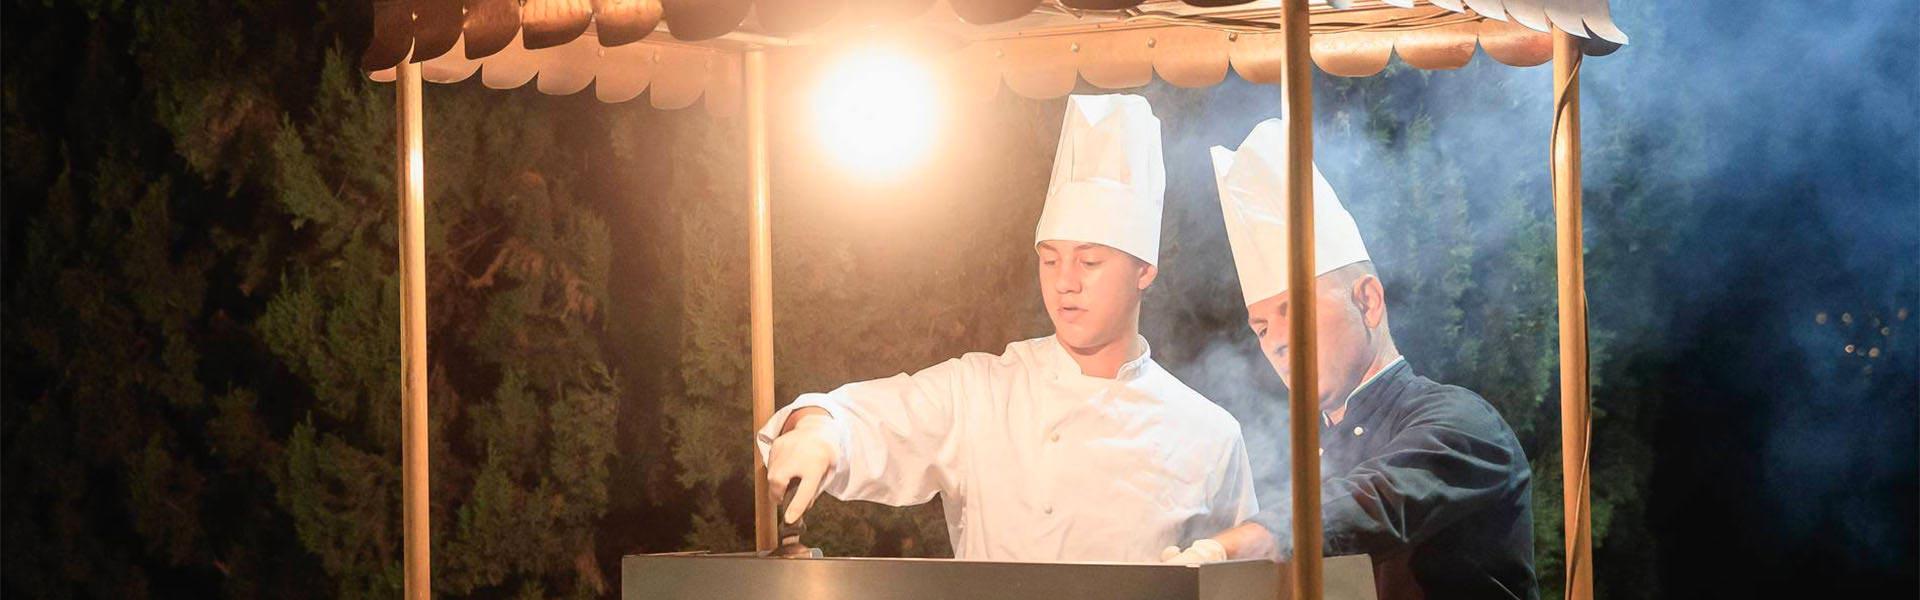 catering a domicilio catering e banqueting